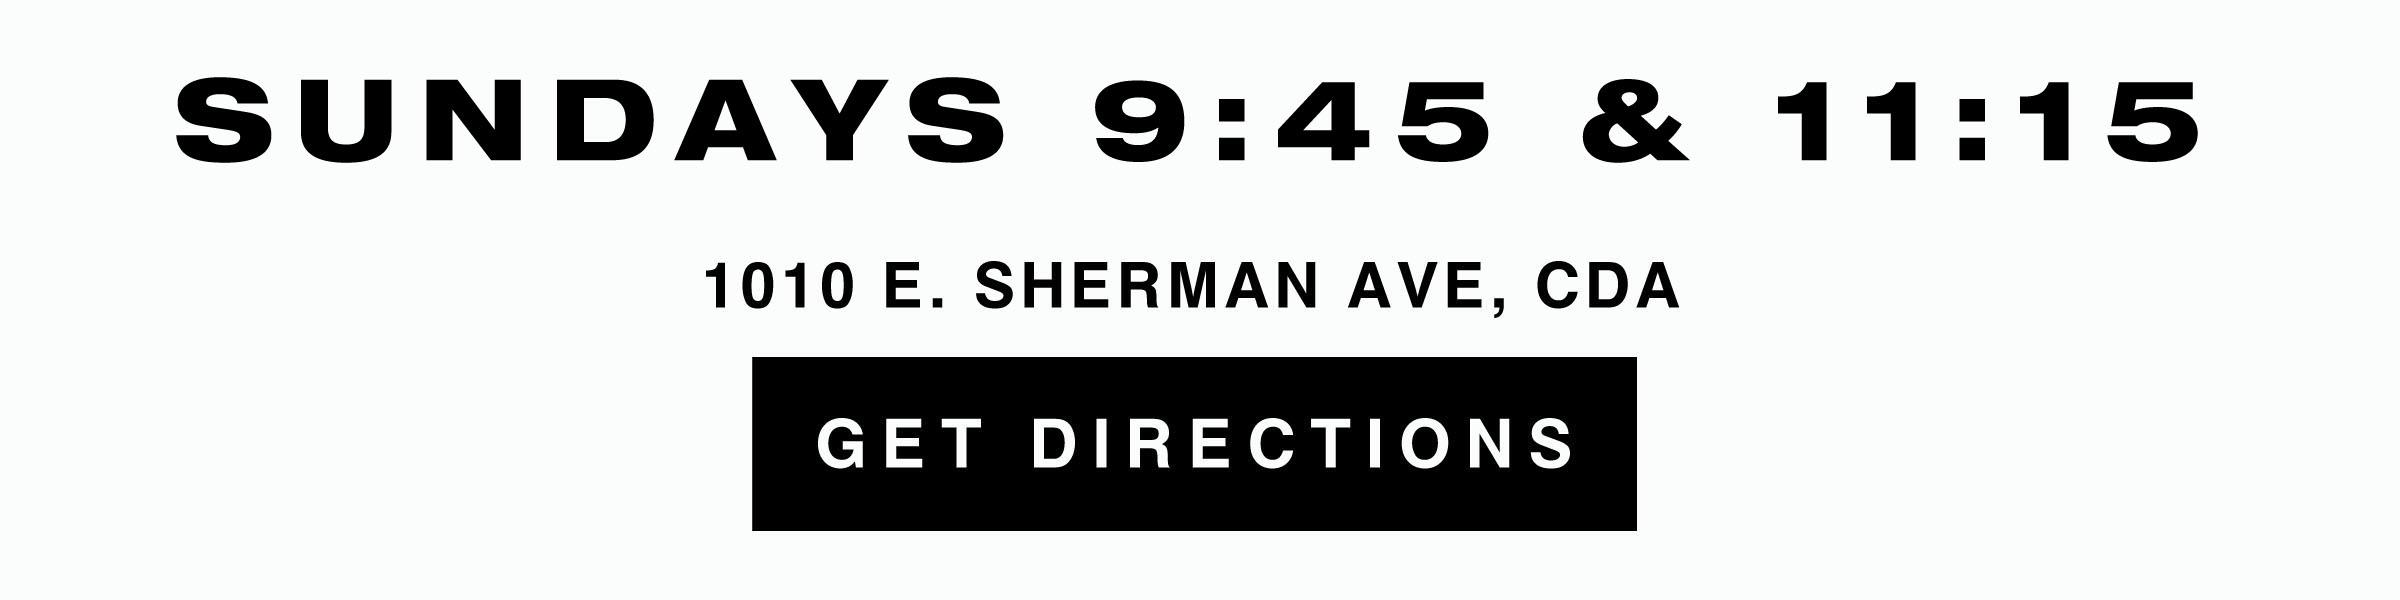 Get Directions 945.jpg